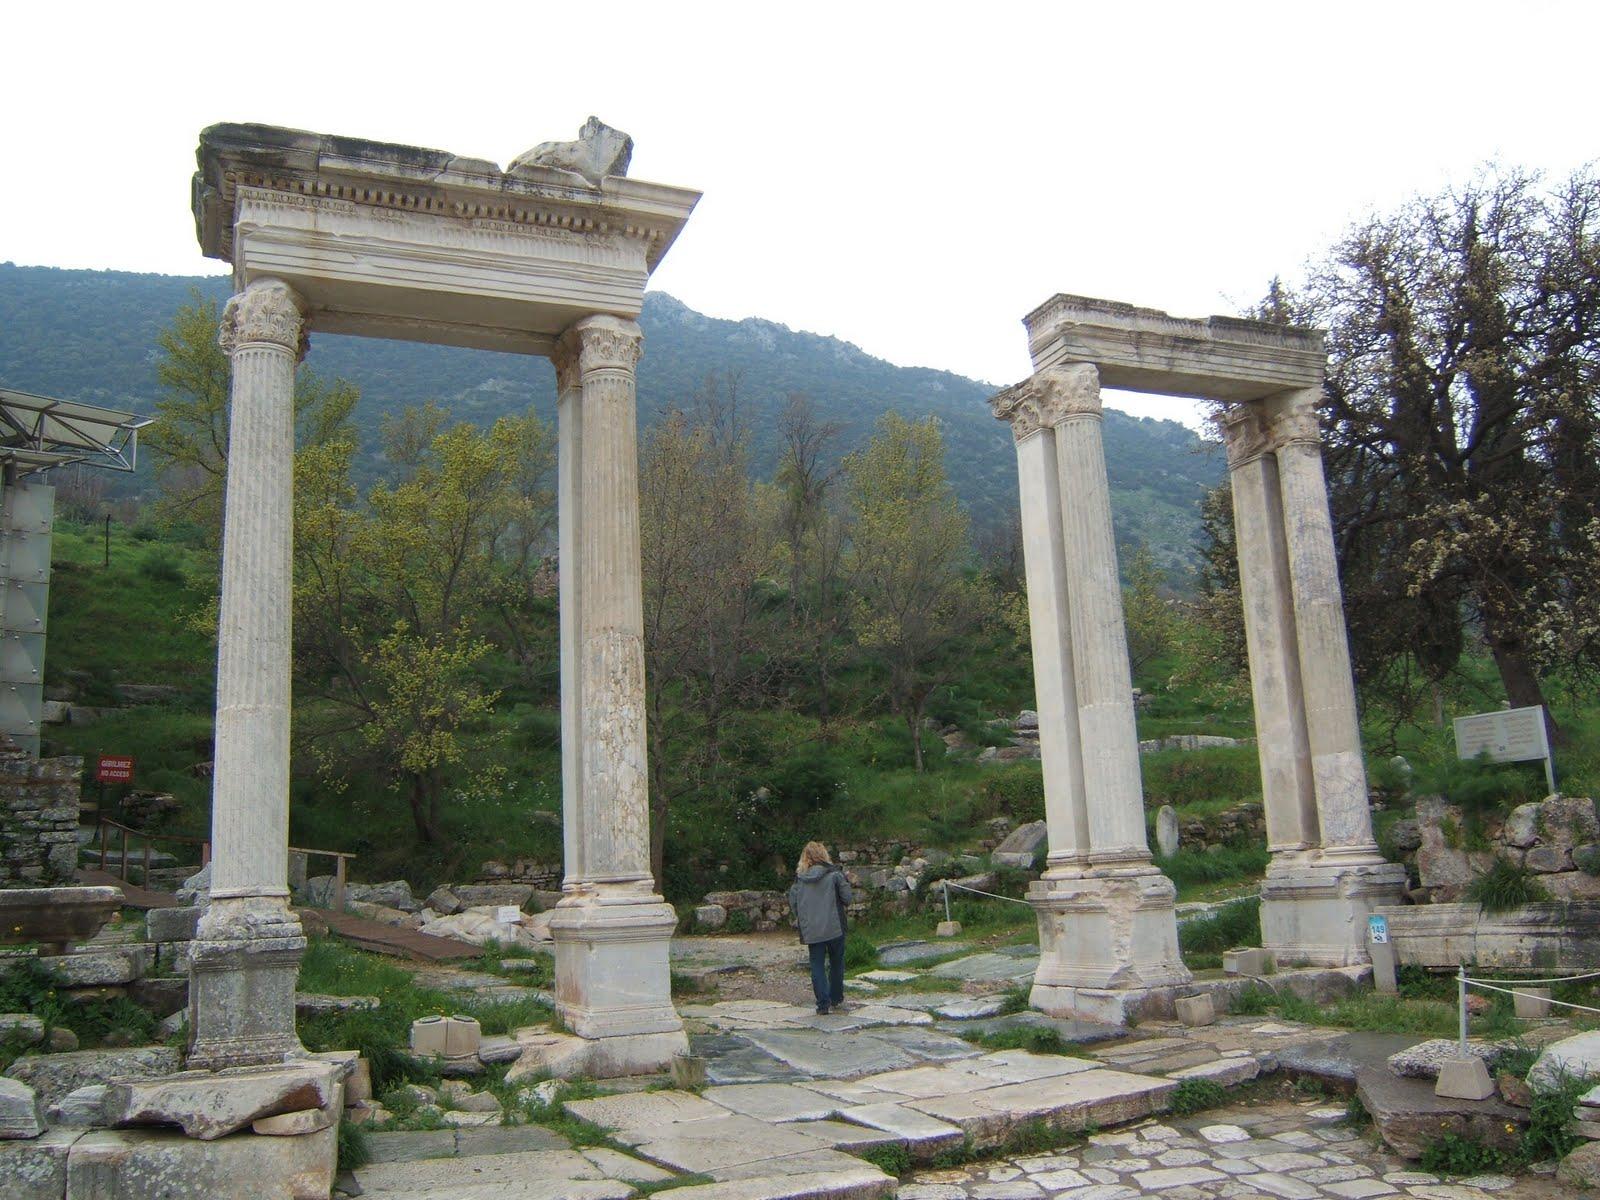 Columns at Ephesus.